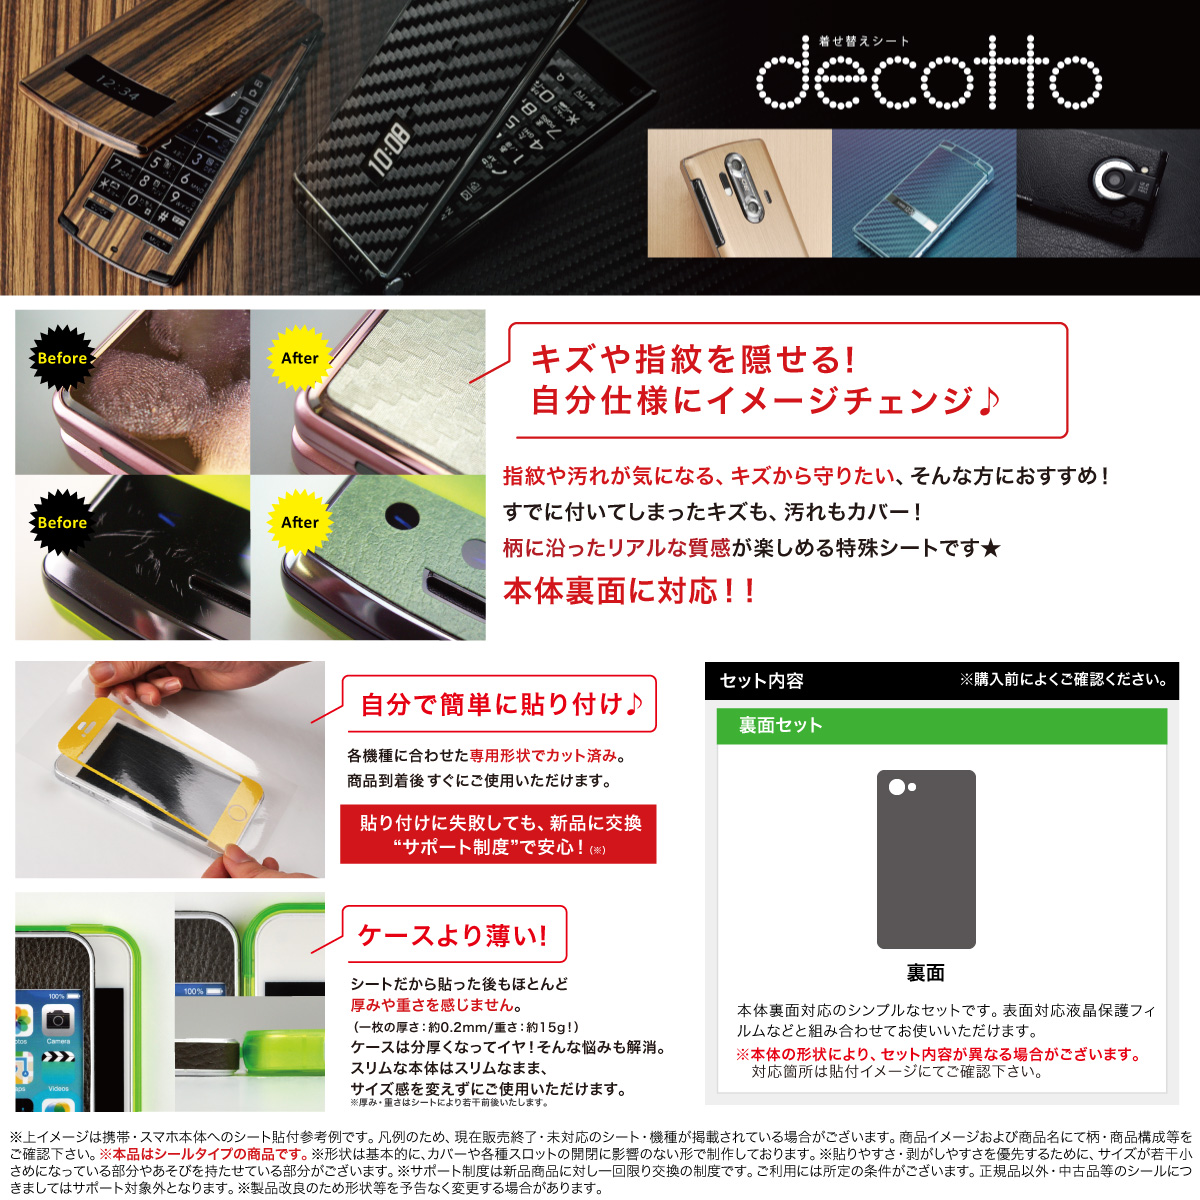 XperiaXZ2 SO-03K SOV37 702SO 専用 デコ デザインシート decotto 裏面 【 レザー・カーボン他 柄が選べます】